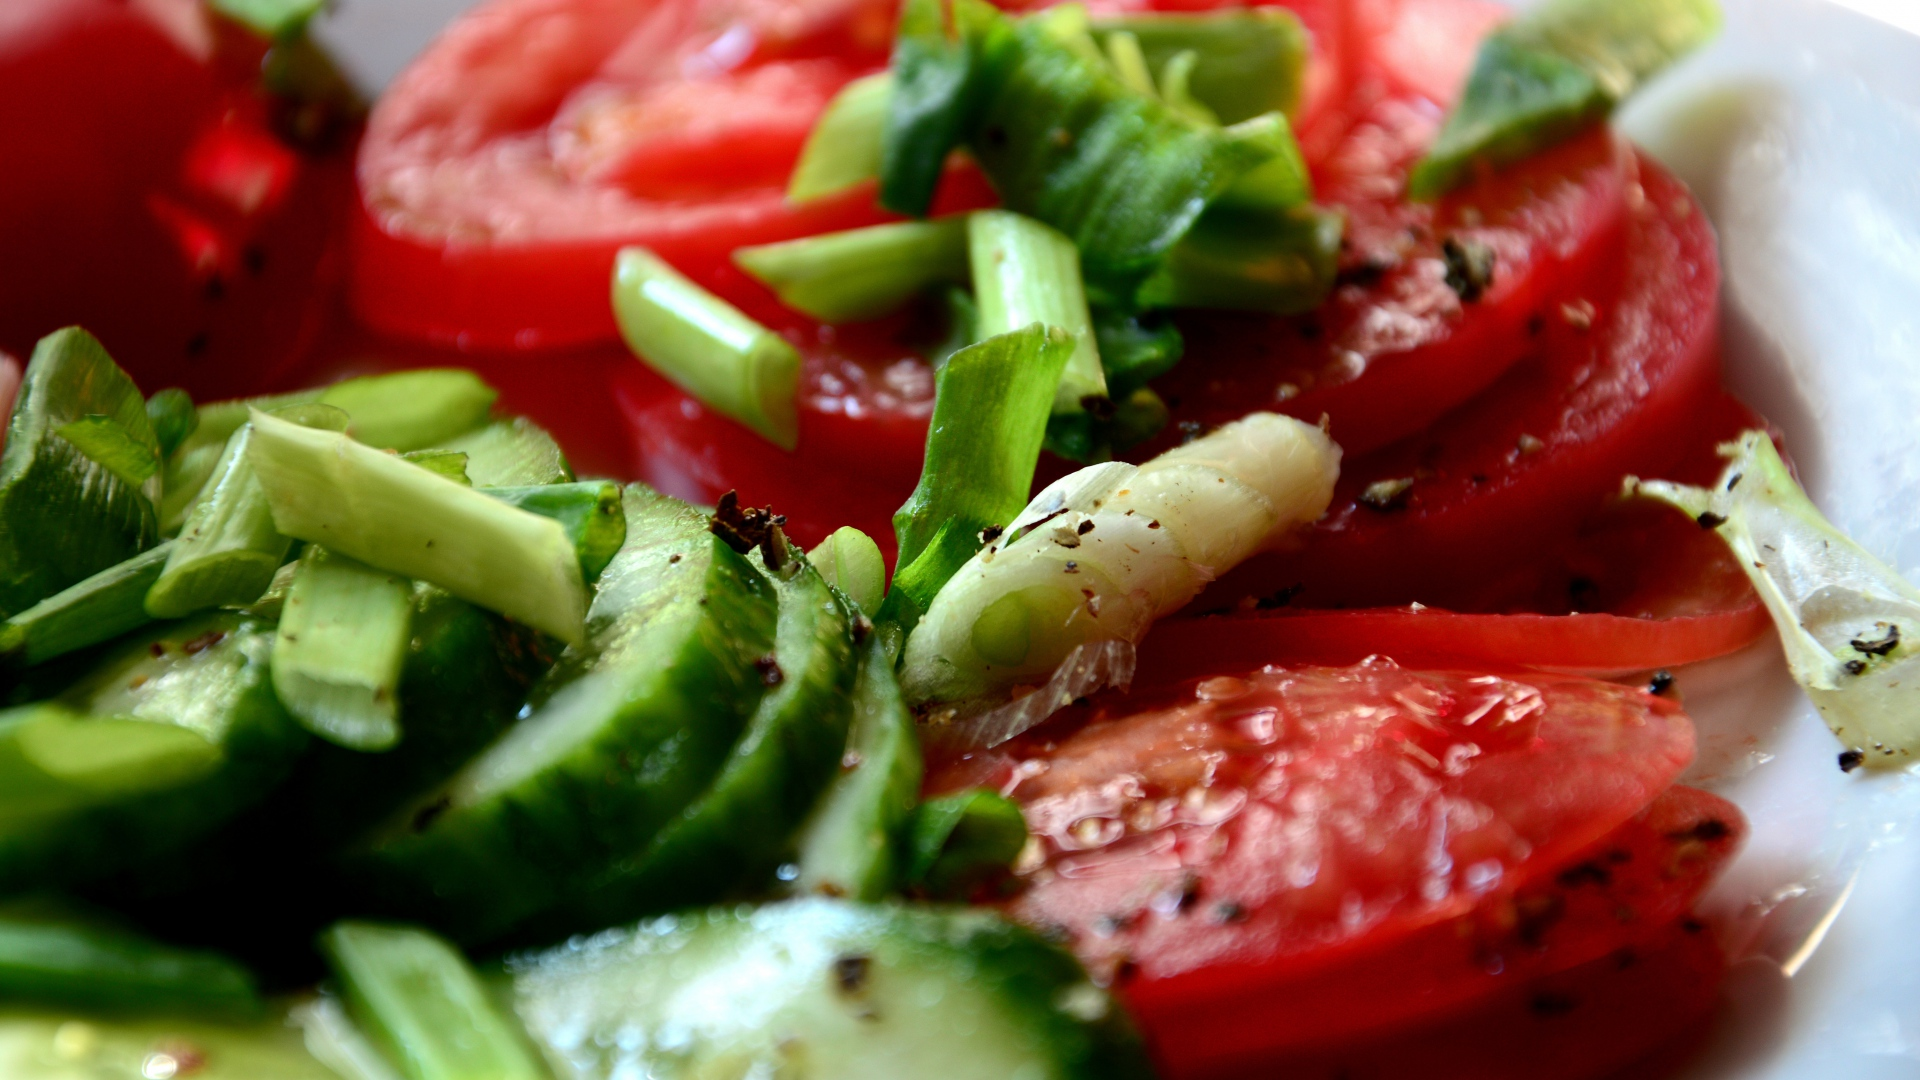 hd hintergrundbilder kr uter gurken butter salat tomaten desktop hintergrund. Black Bedroom Furniture Sets. Home Design Ideas